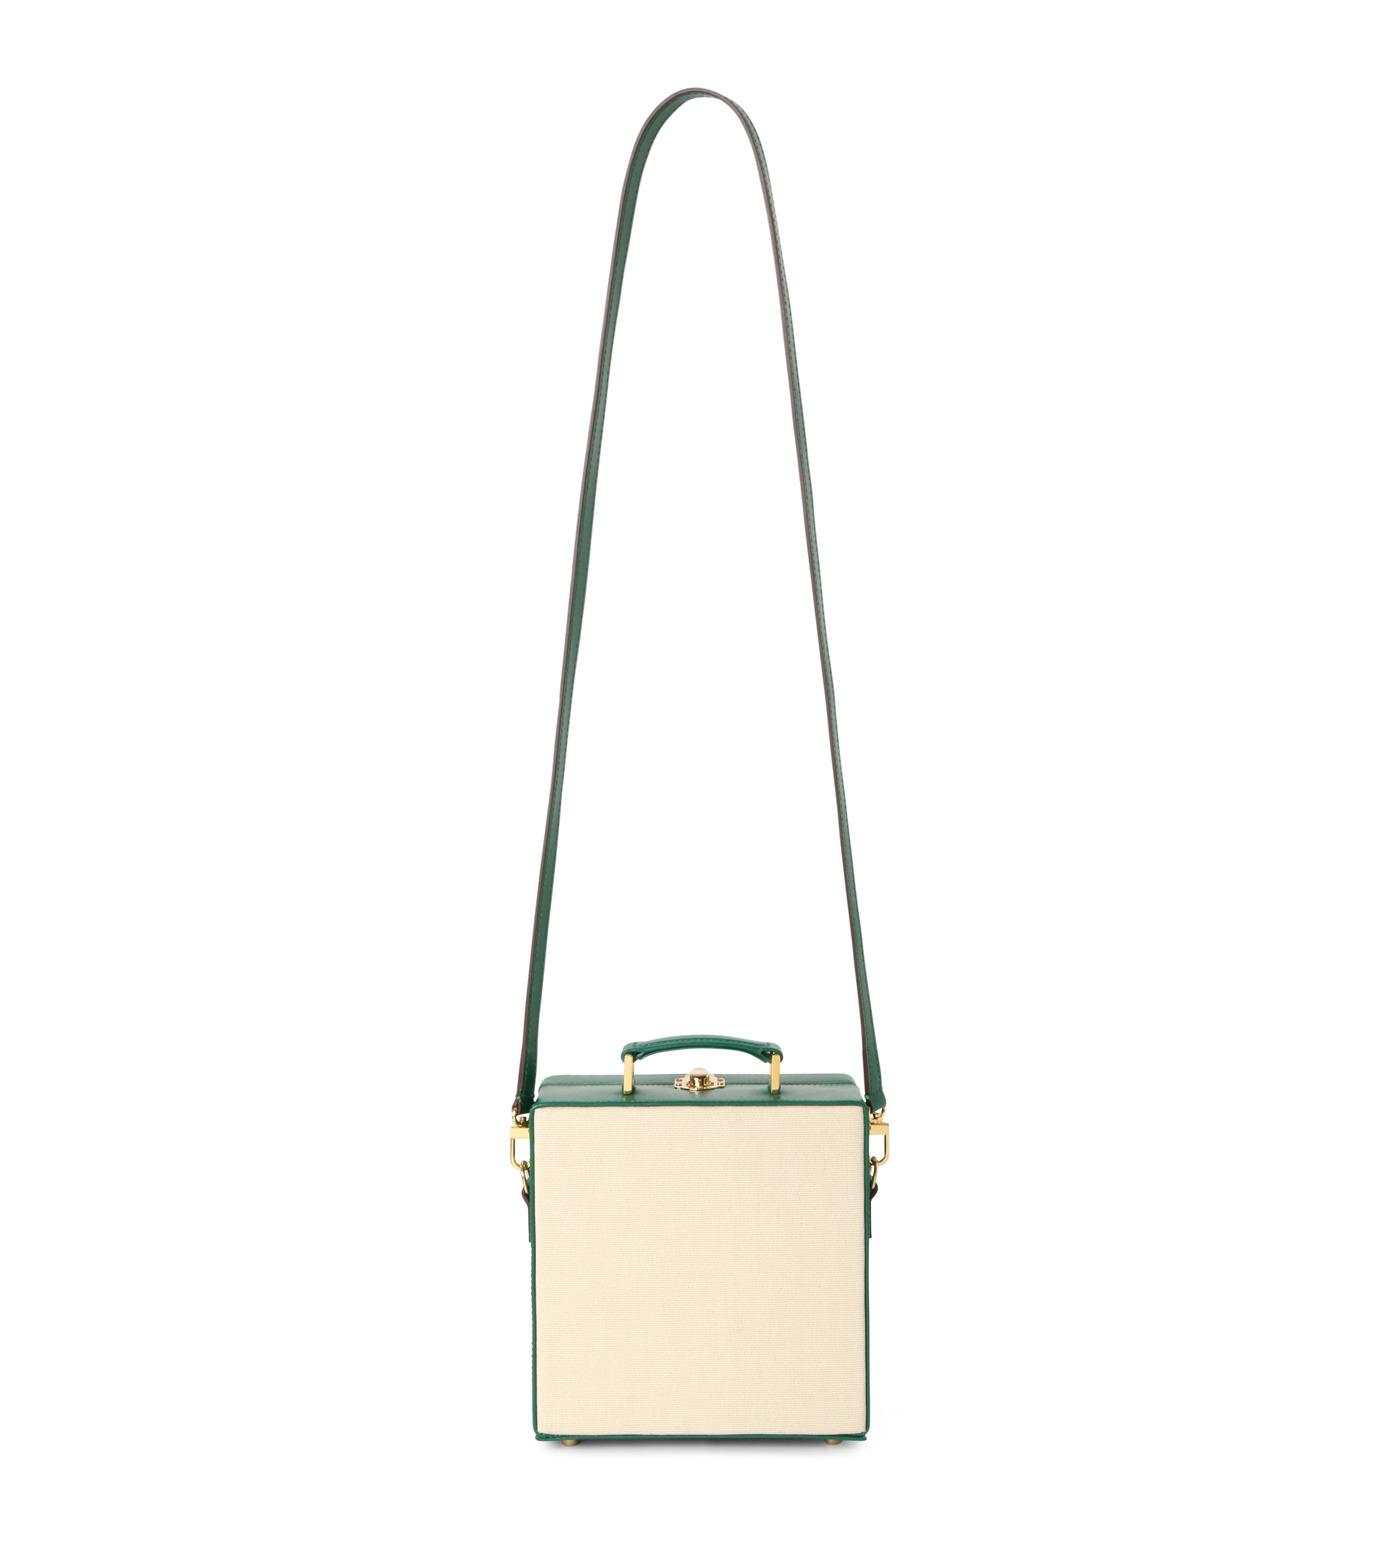 Olympia Le-Tan(オリンピア ルタン)のLittle Miss Naughty 7-Inch-WHITE(ショルダーバッグ/shoulder bag)-FW16B7I007-5 拡大詳細画像3